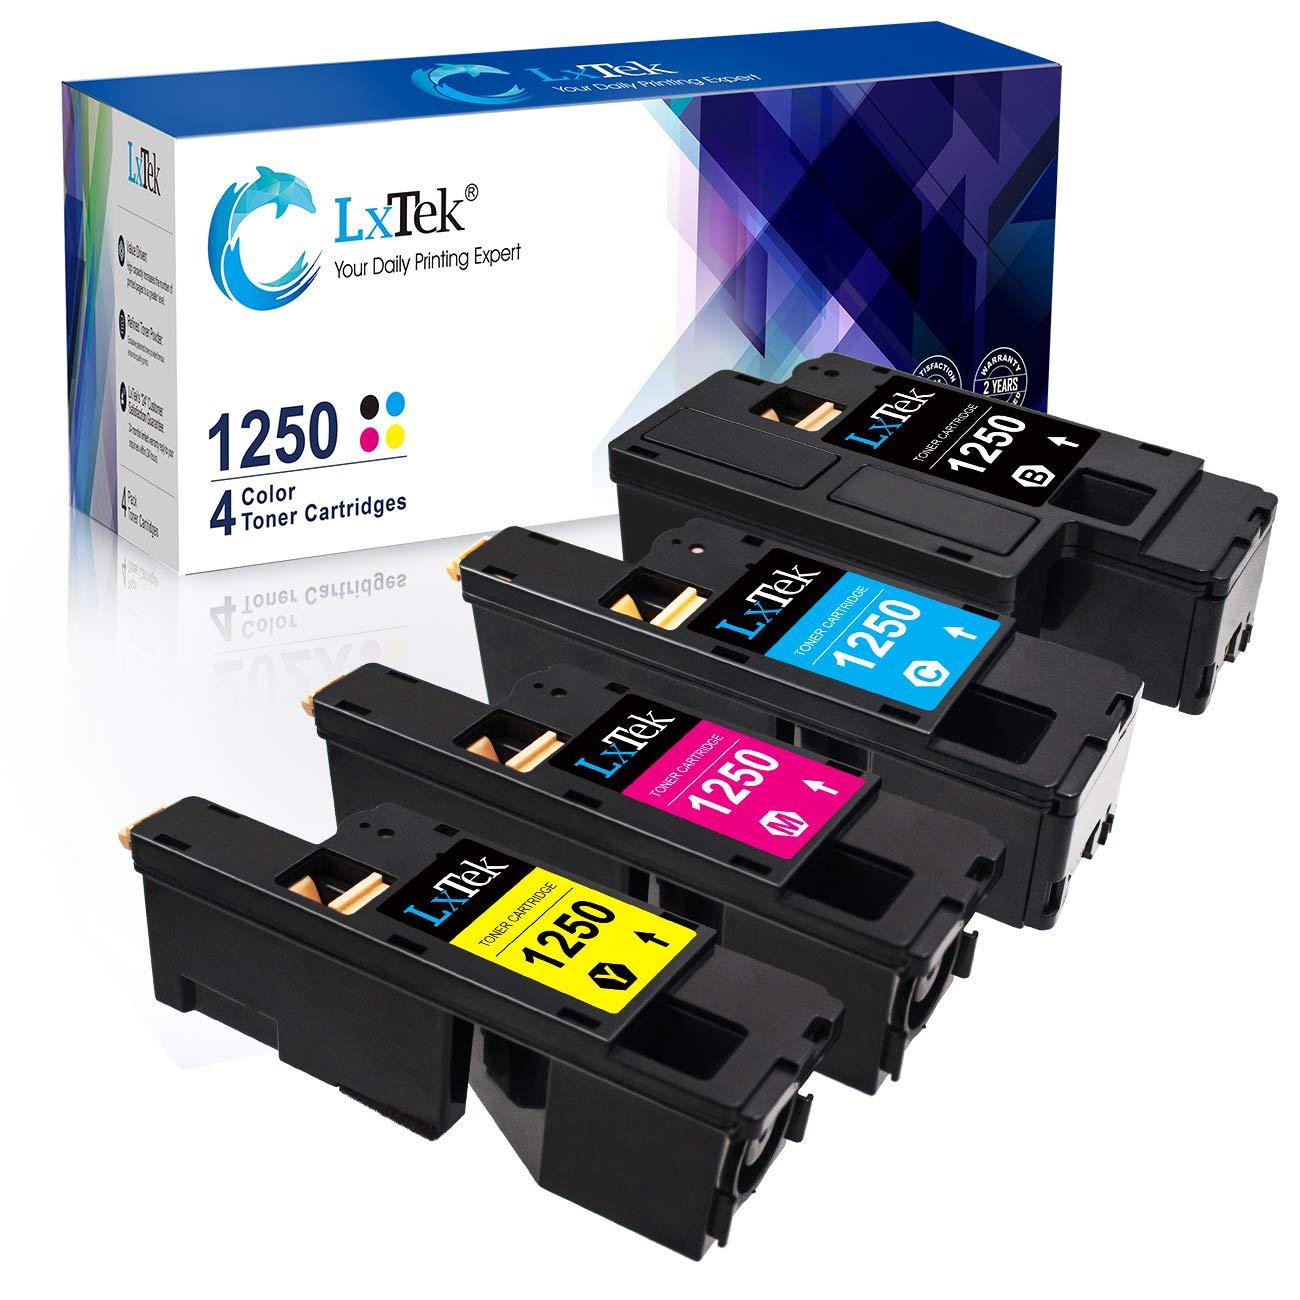 Toner Alternativo ( X4 ) 4 Colores 1250 810WH C5GC3 XMX5D WM2JC 1250c C1760nw C1765nfw C1765nf 1350cnw 1355cn 1355cnw